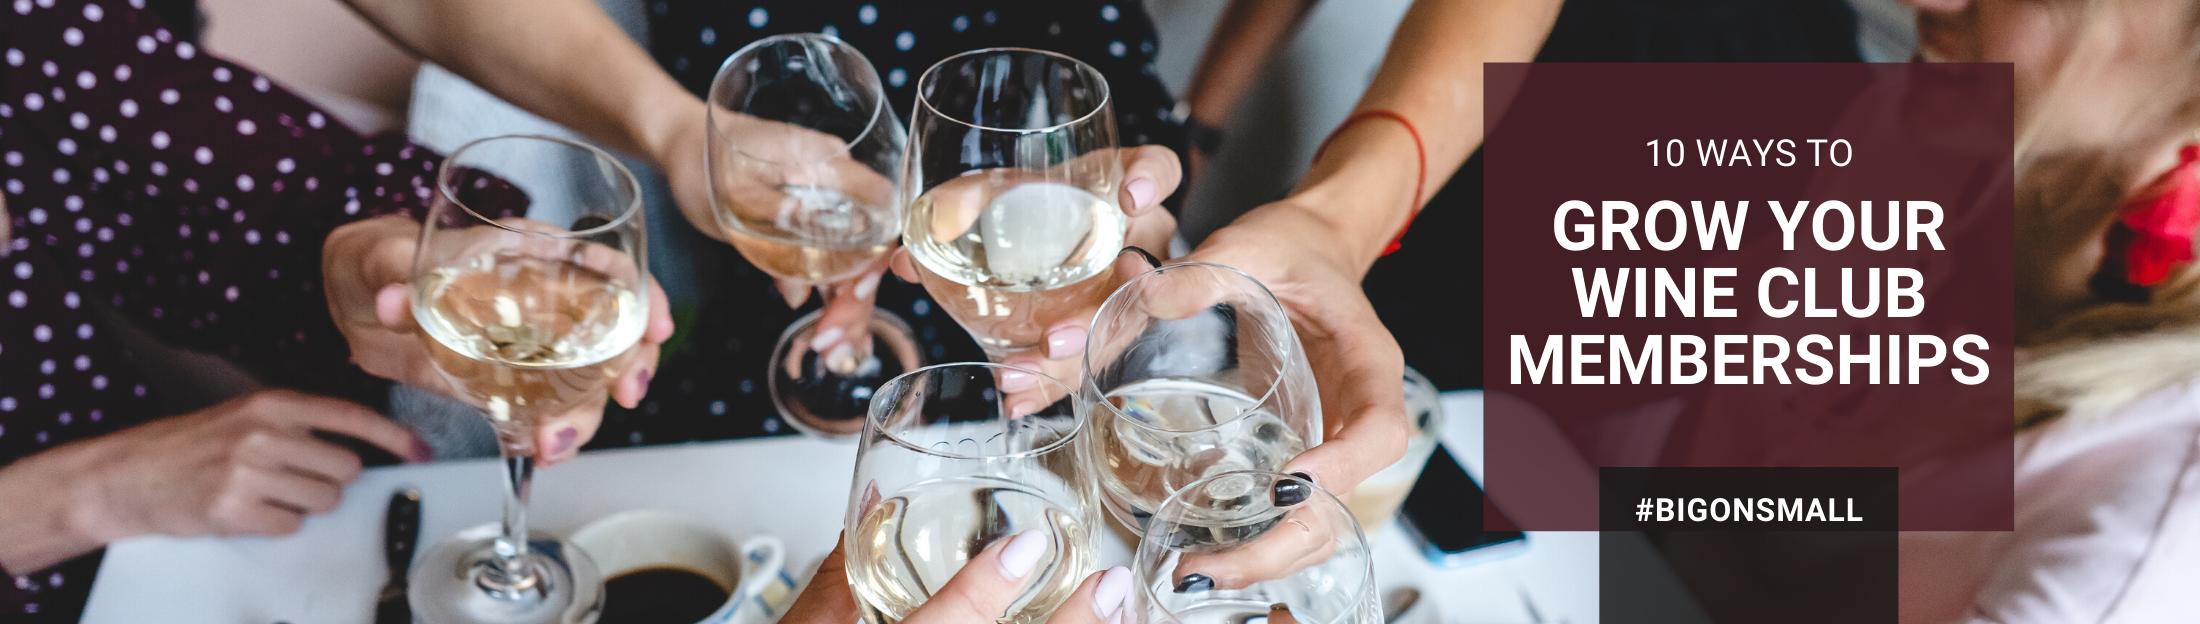 10 Ways to GROW Your Wine Club Memberships